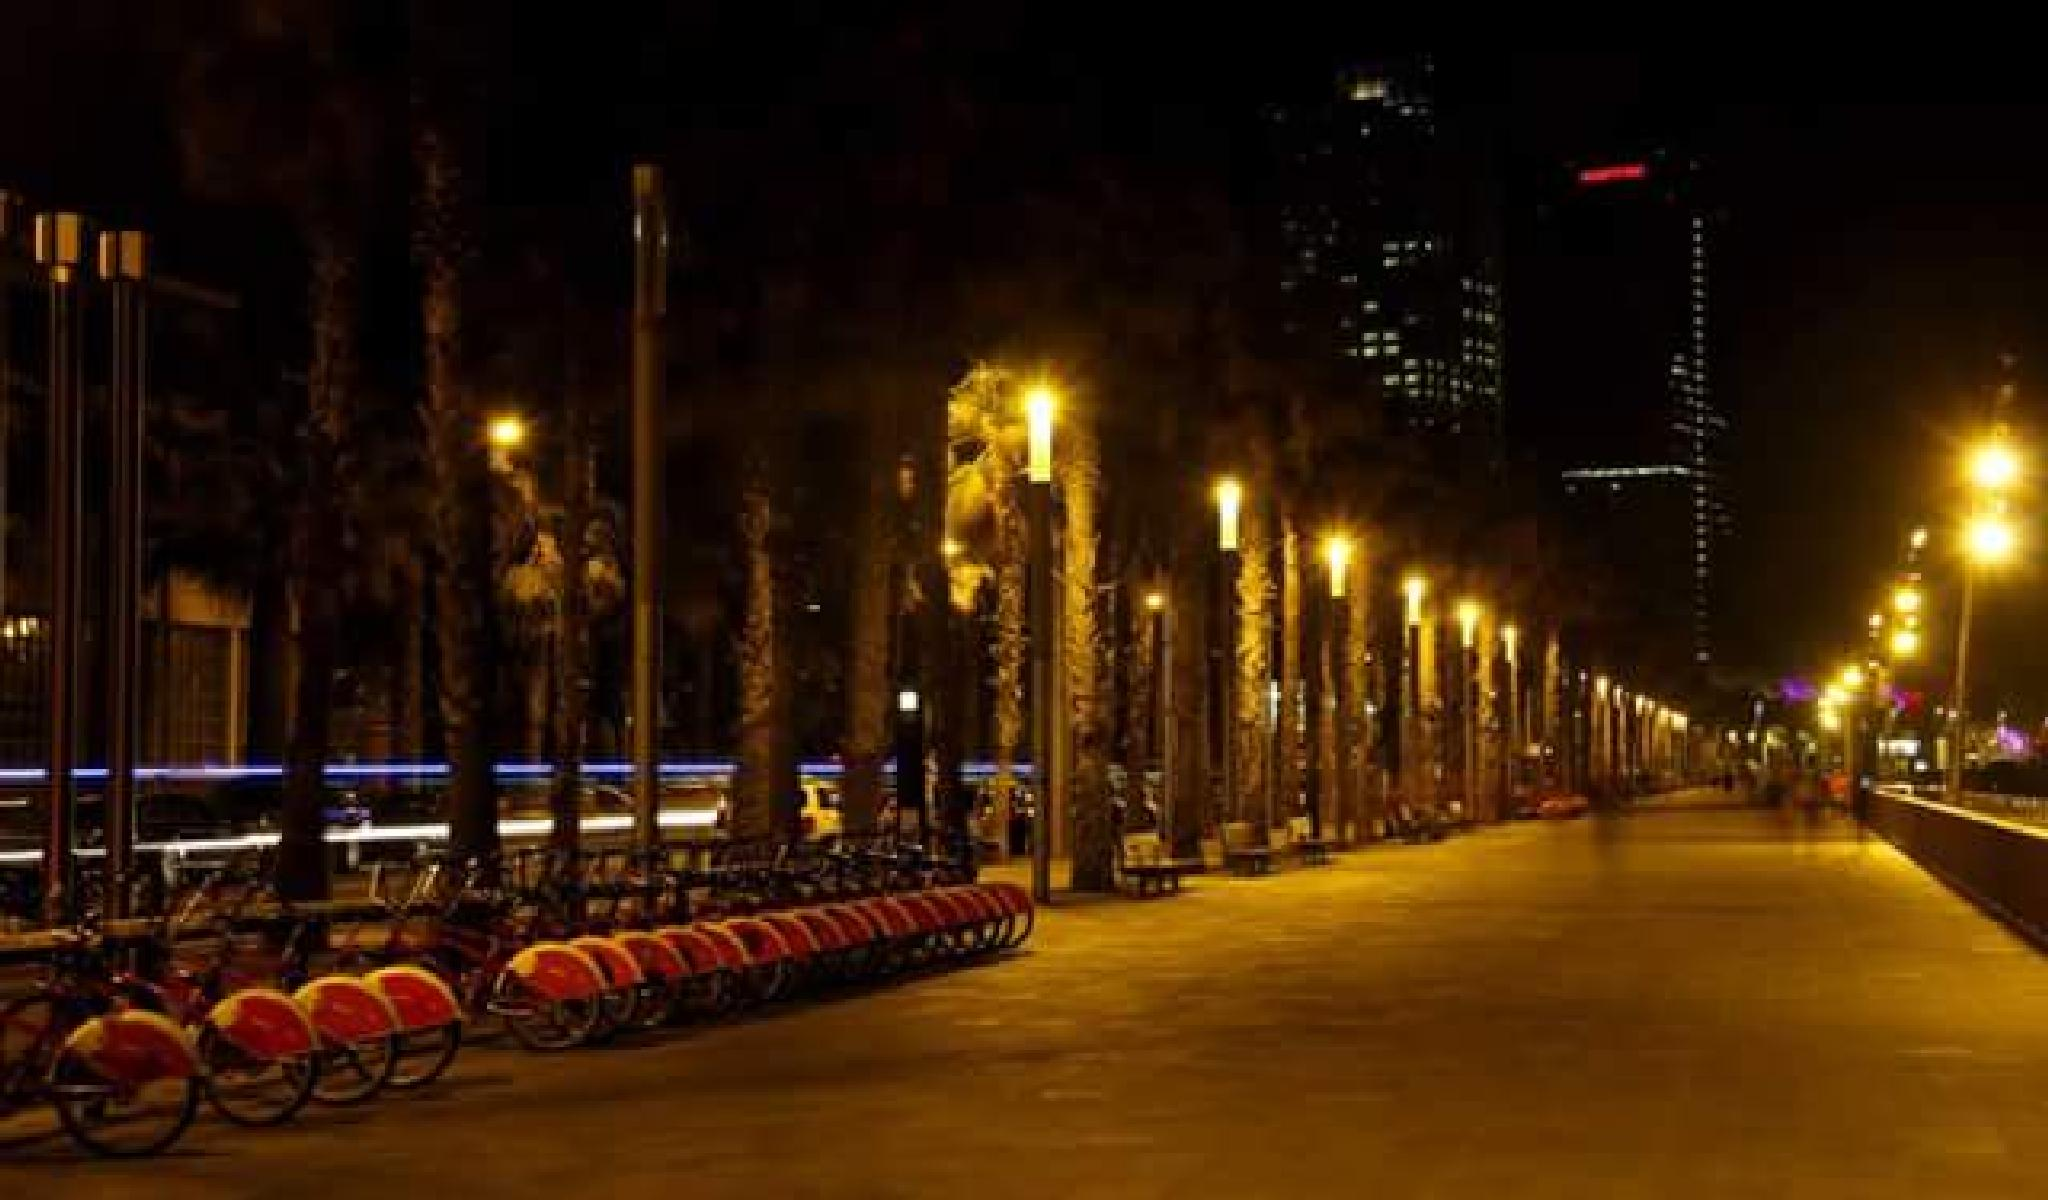 beach avenue by night  Barcelona by lorenzo.lourencothierry